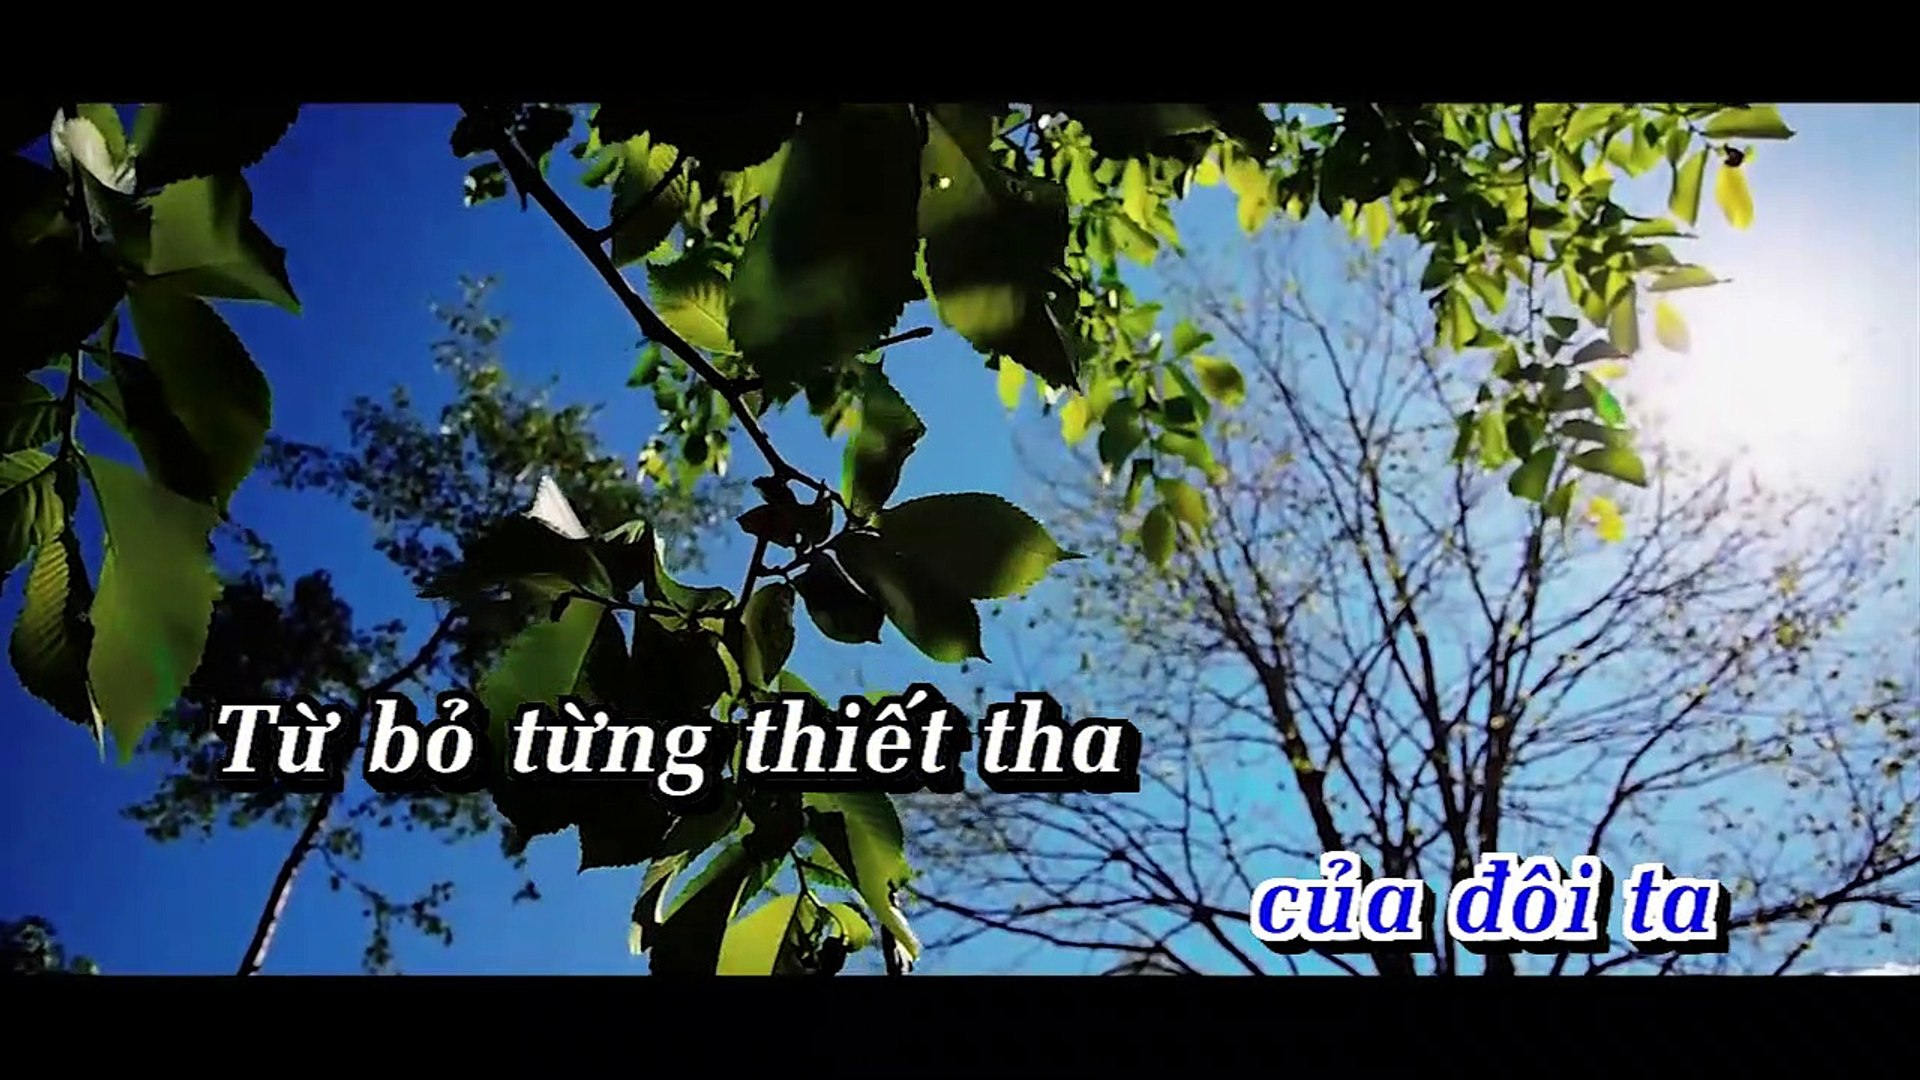 [Karaoke] Từ Bỏ - Khắc Việt [Beat]